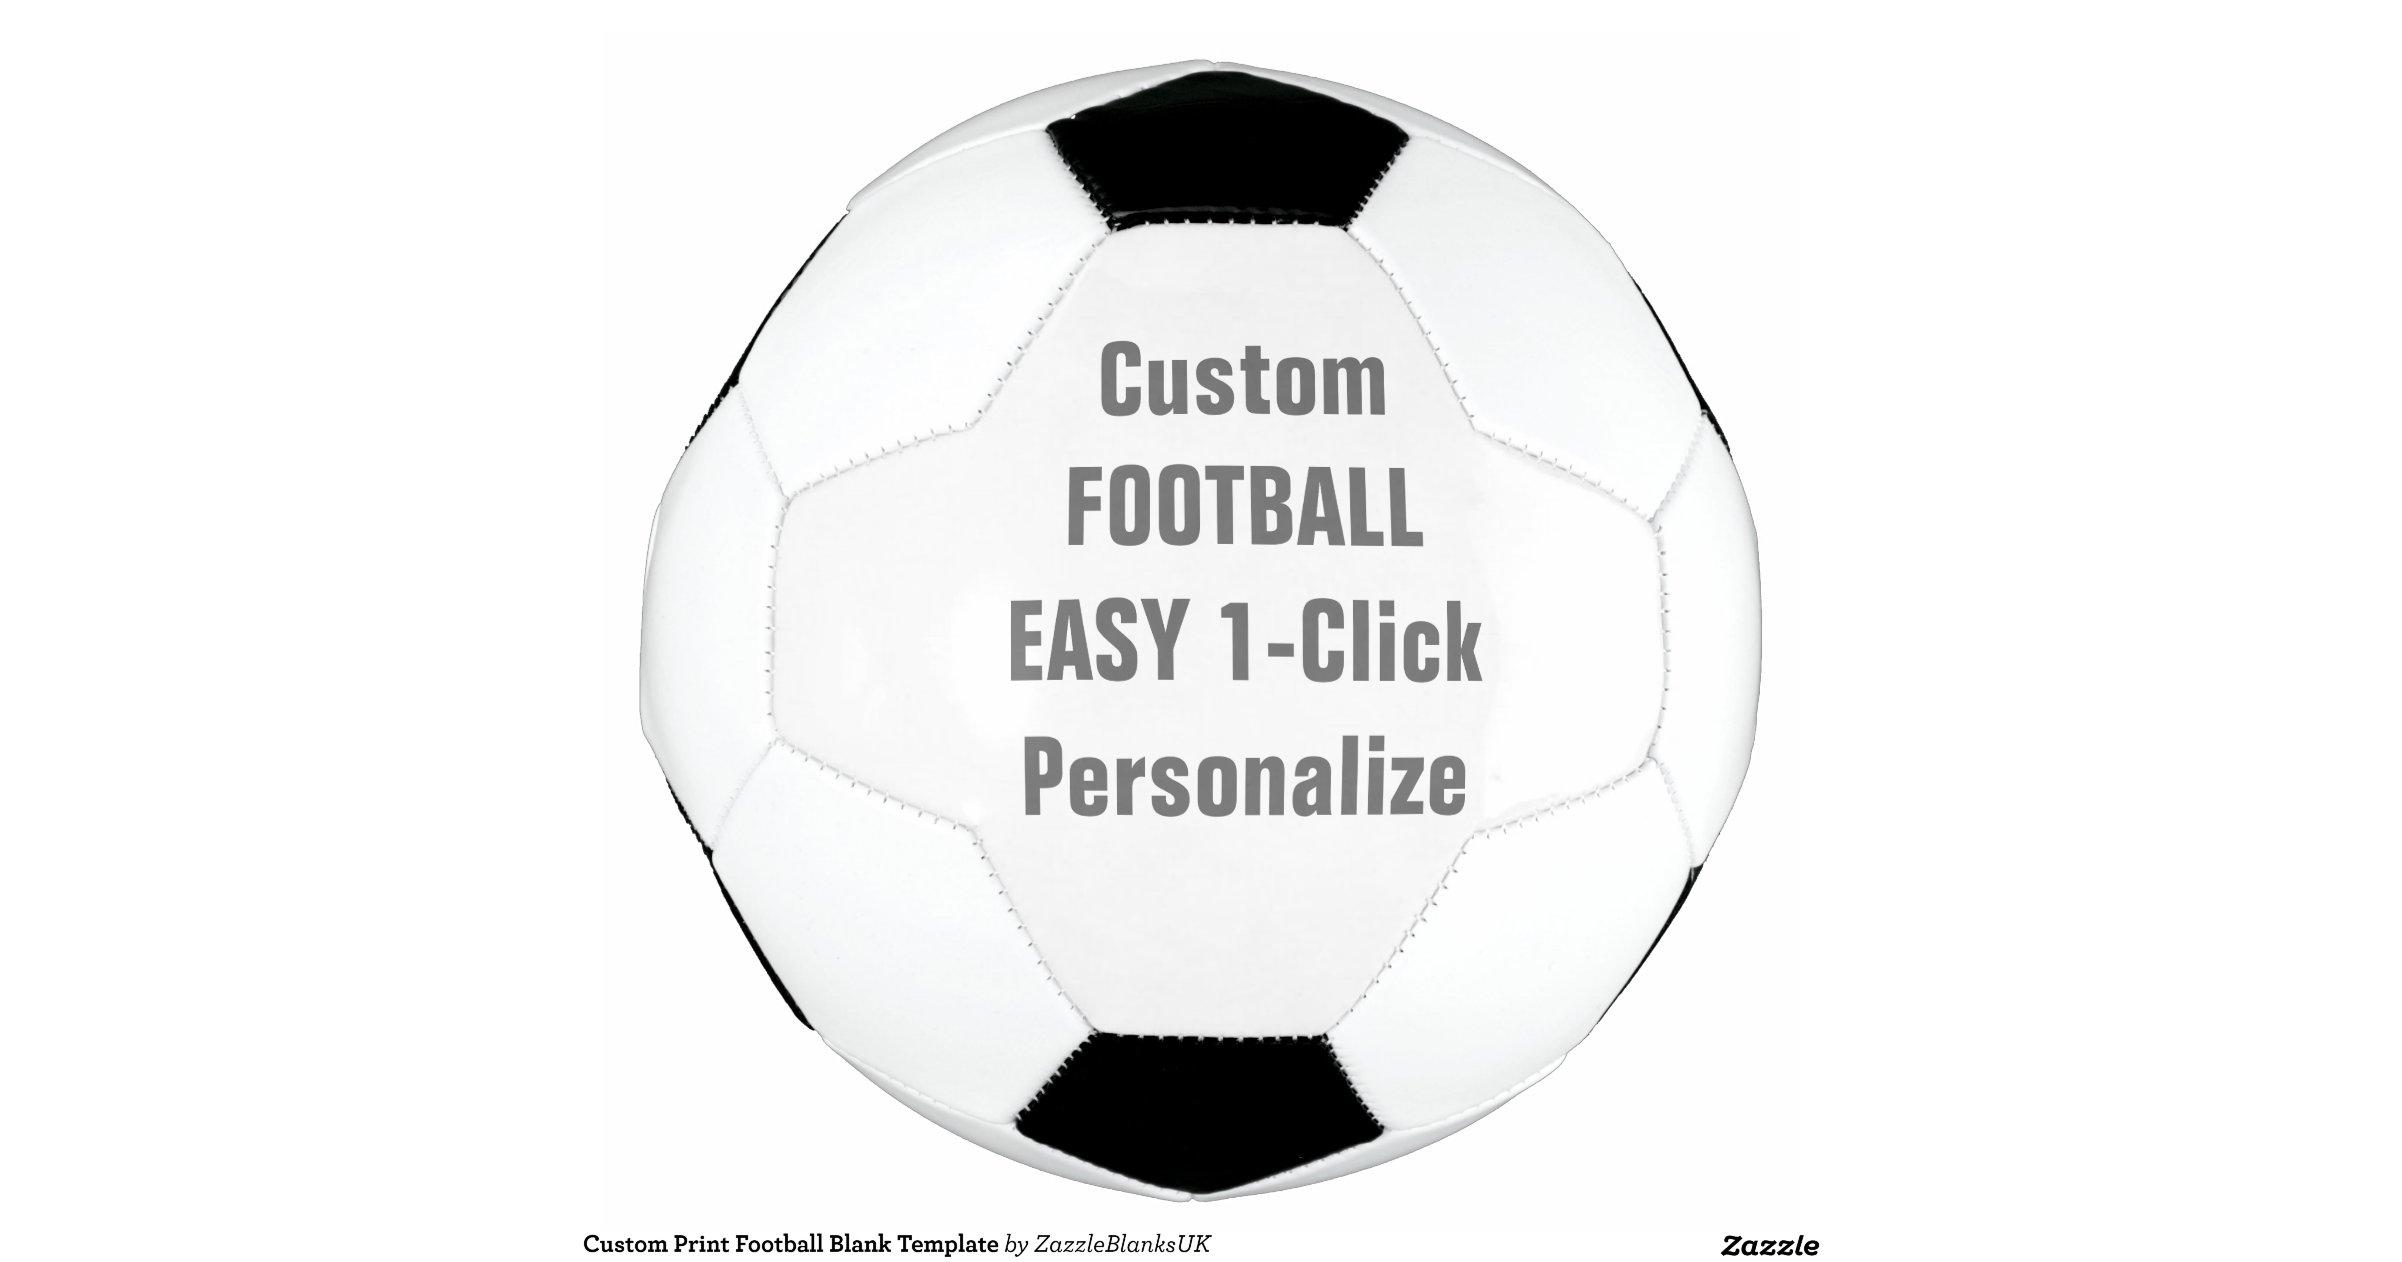 custom_print_football_blank_template_soccer_ball